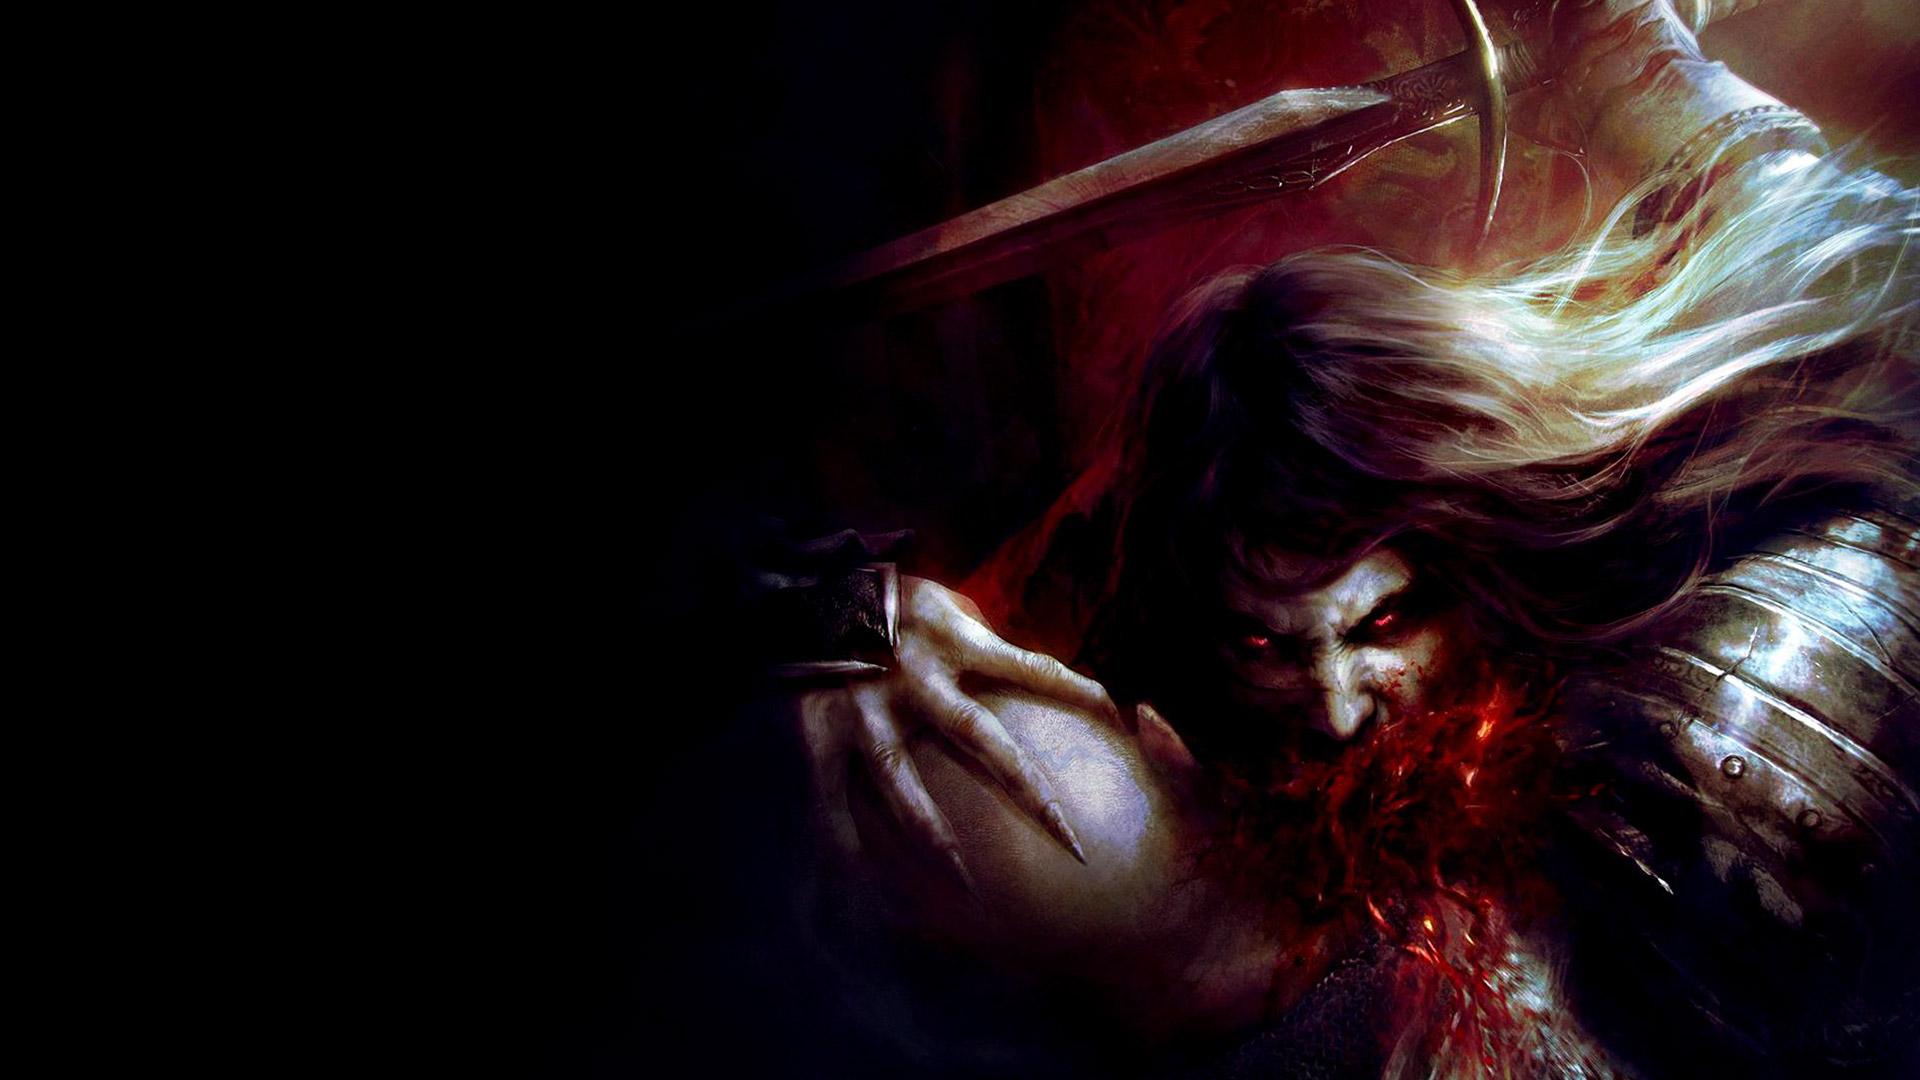 General 1920x1080 Castlevania Castlevania: Lords of Shadow 2 video game art red eyes blood video games dark fantasy fantasy art glowing eyes